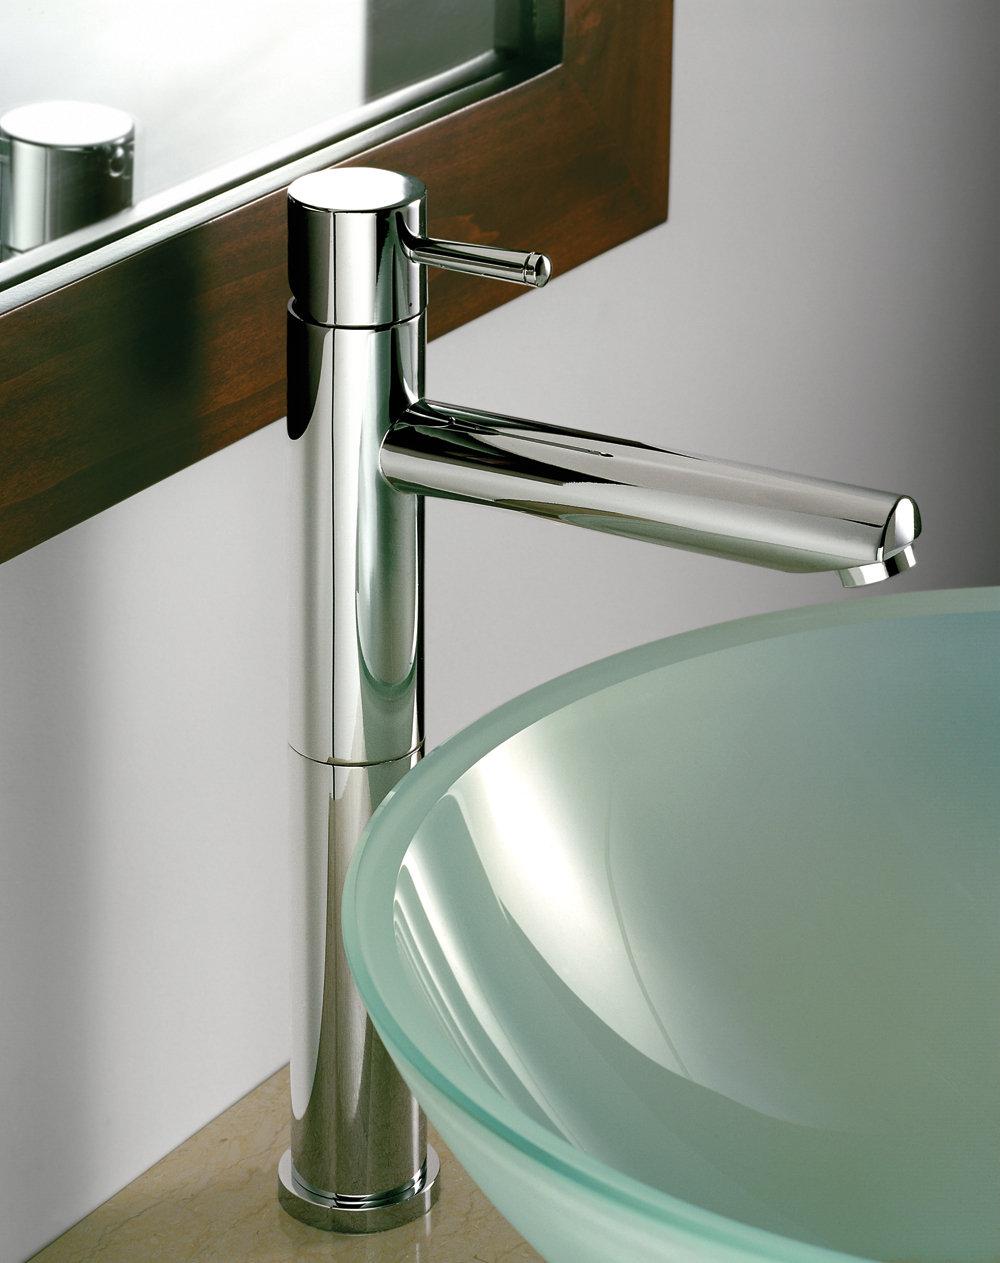 american standard bathroom faucet repair instructions